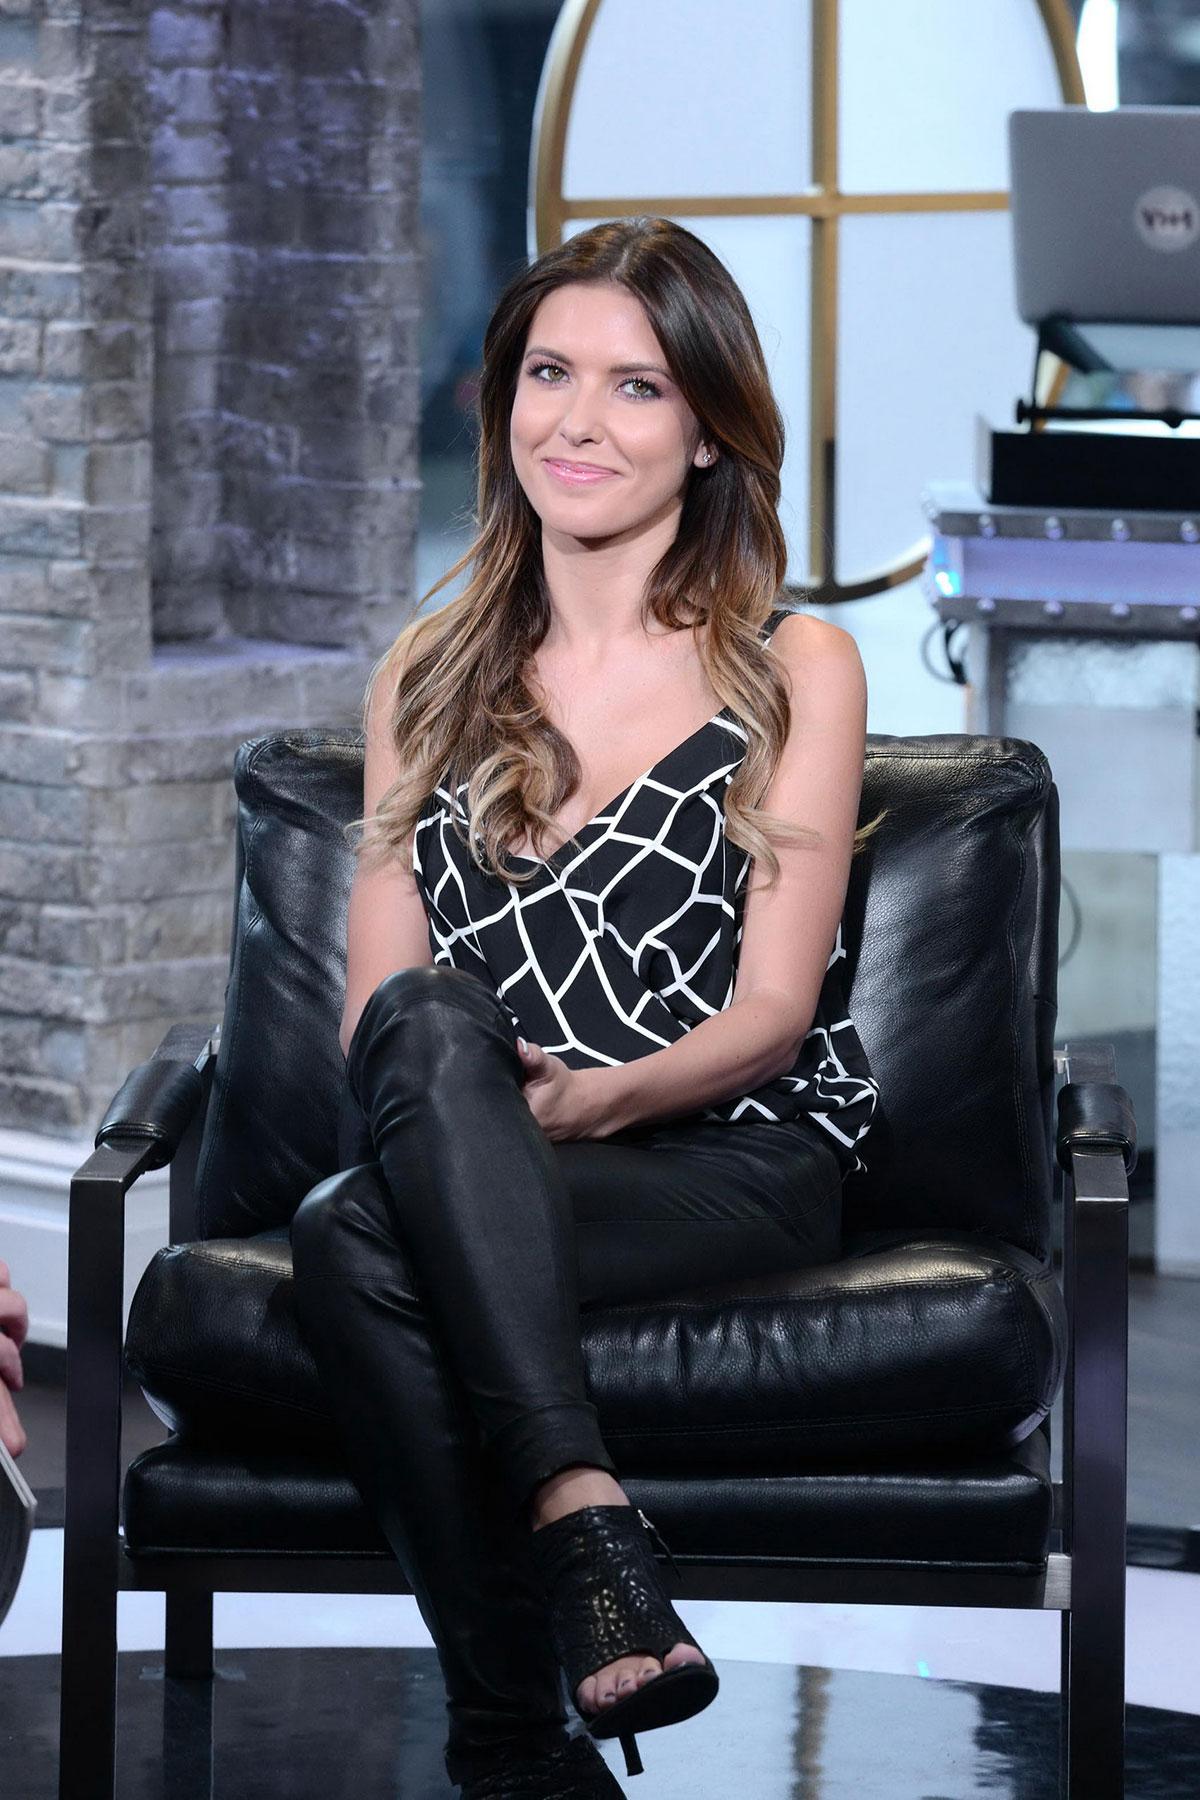 Audrina Patridge attends VH1 Big Morning Buzz